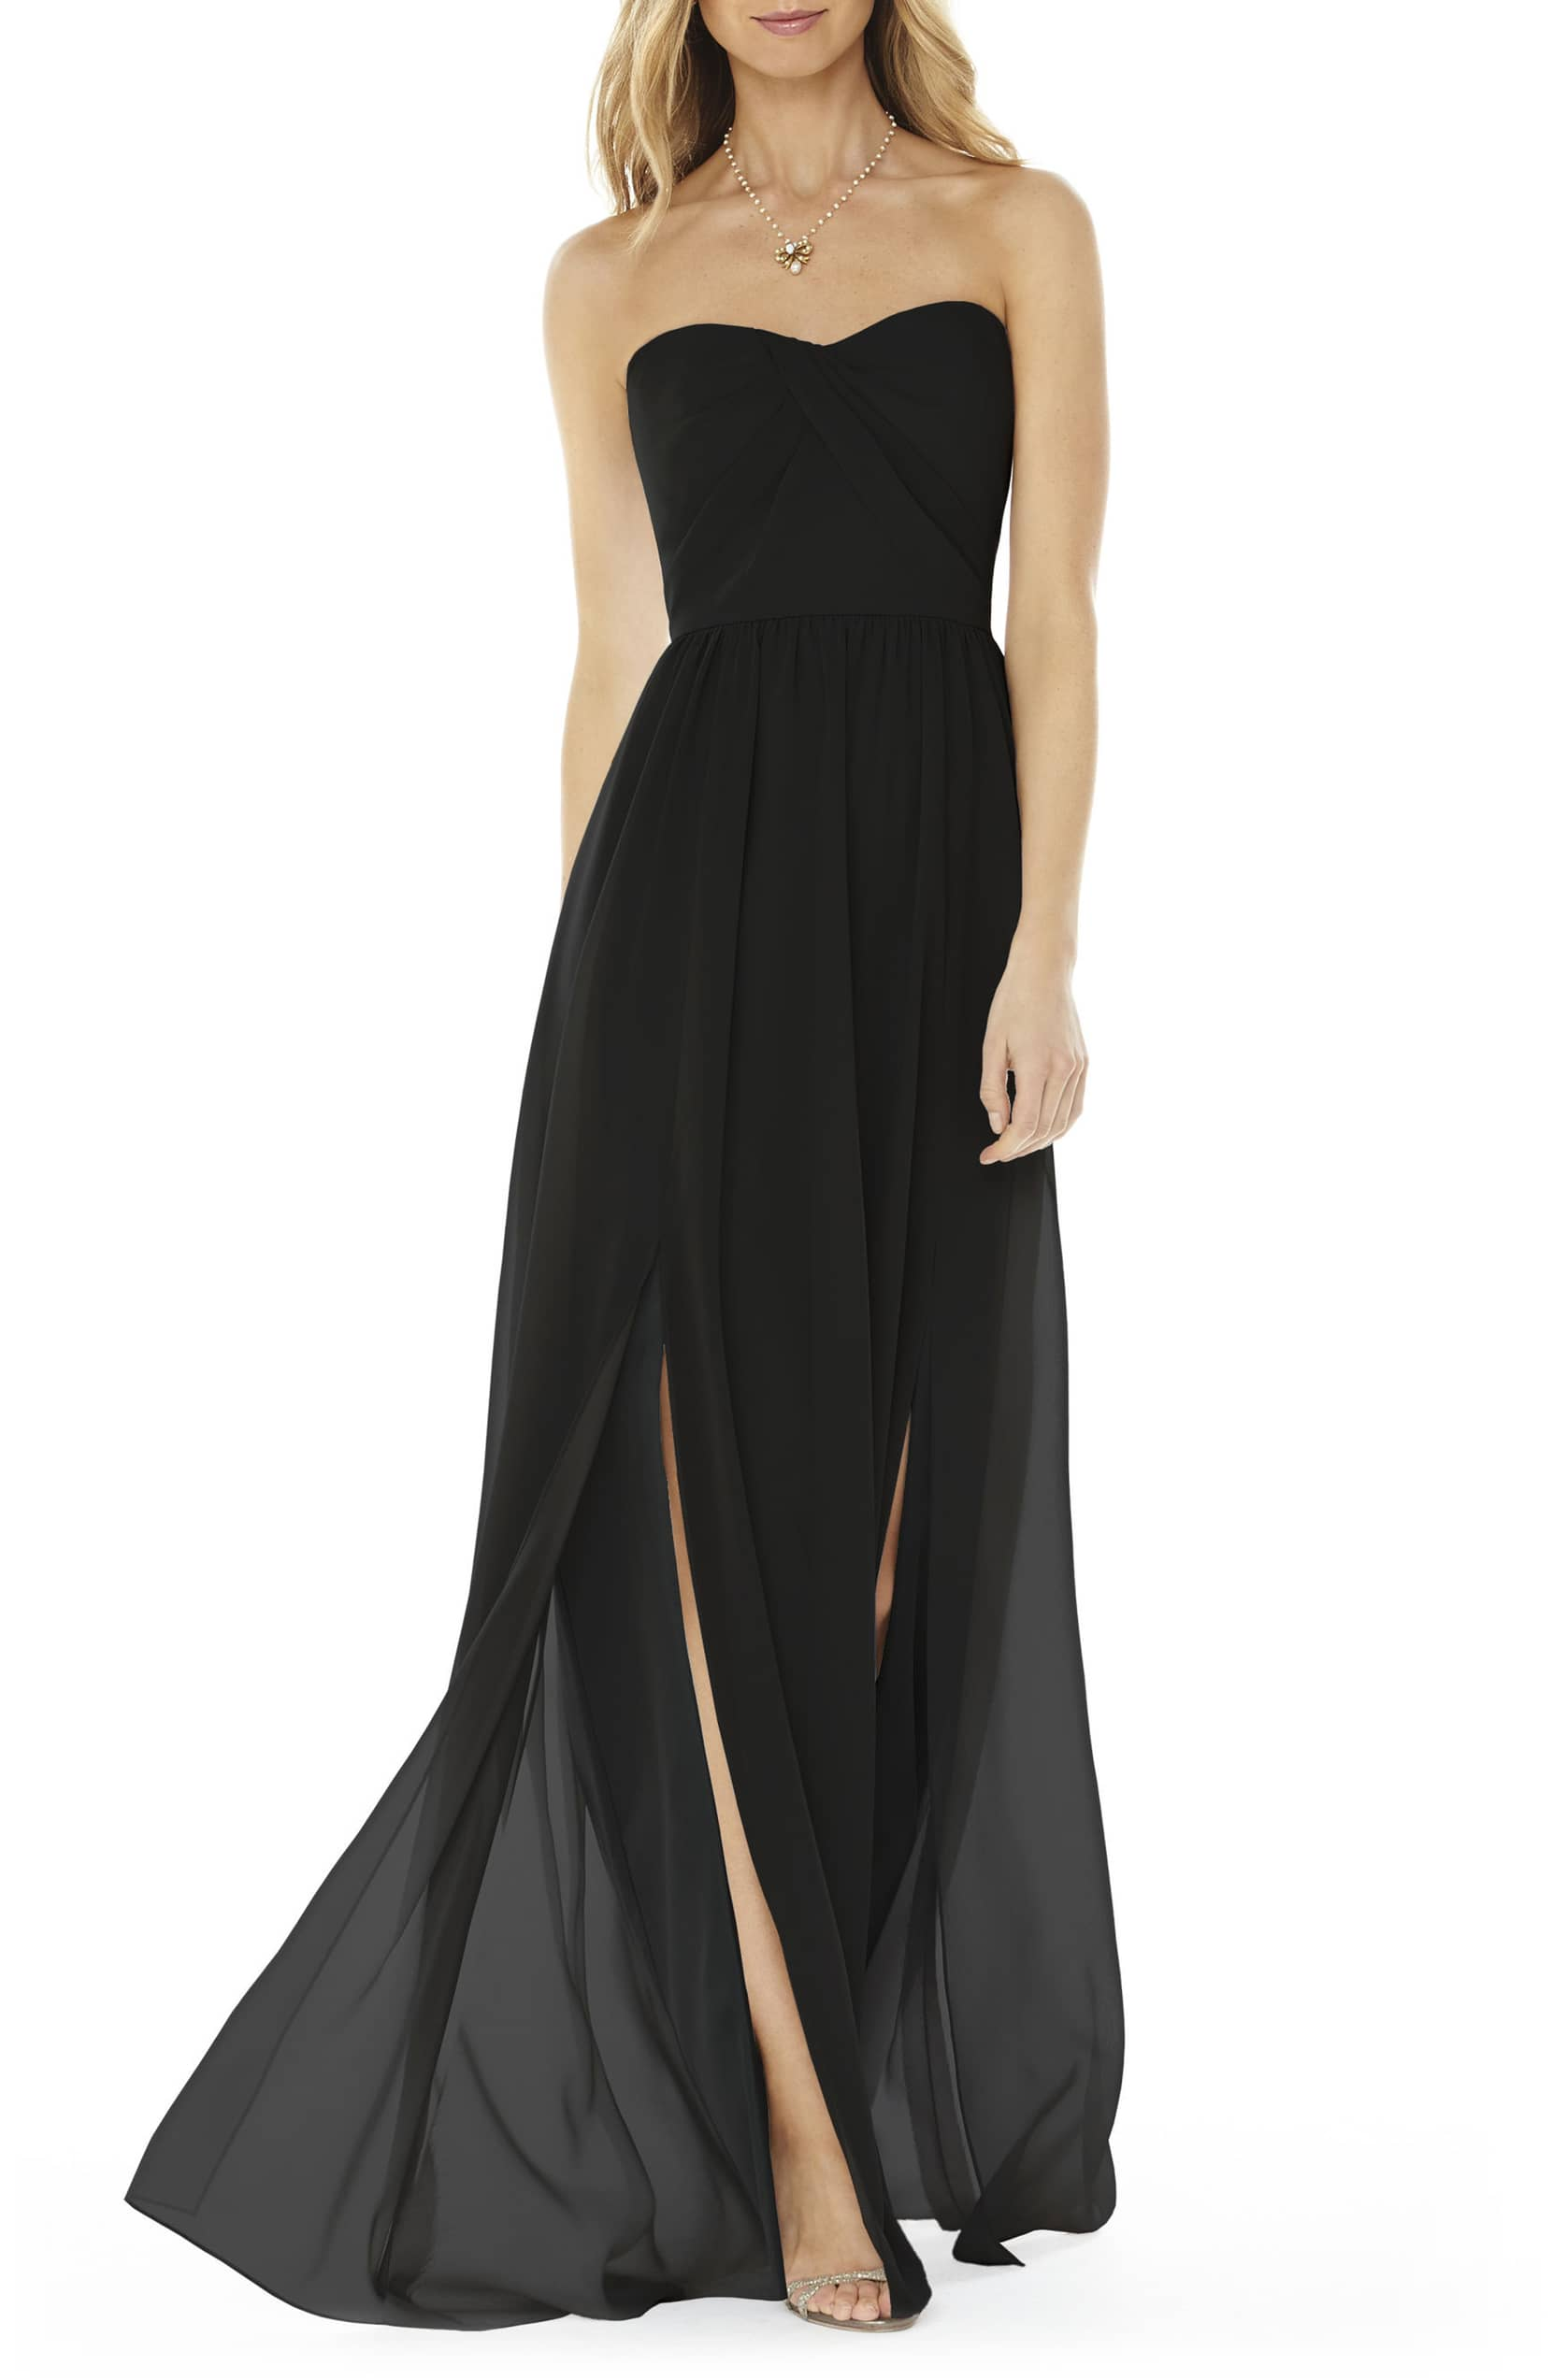 SOCIAL BRIDESMAIDS Strapless Georgette Black Gown